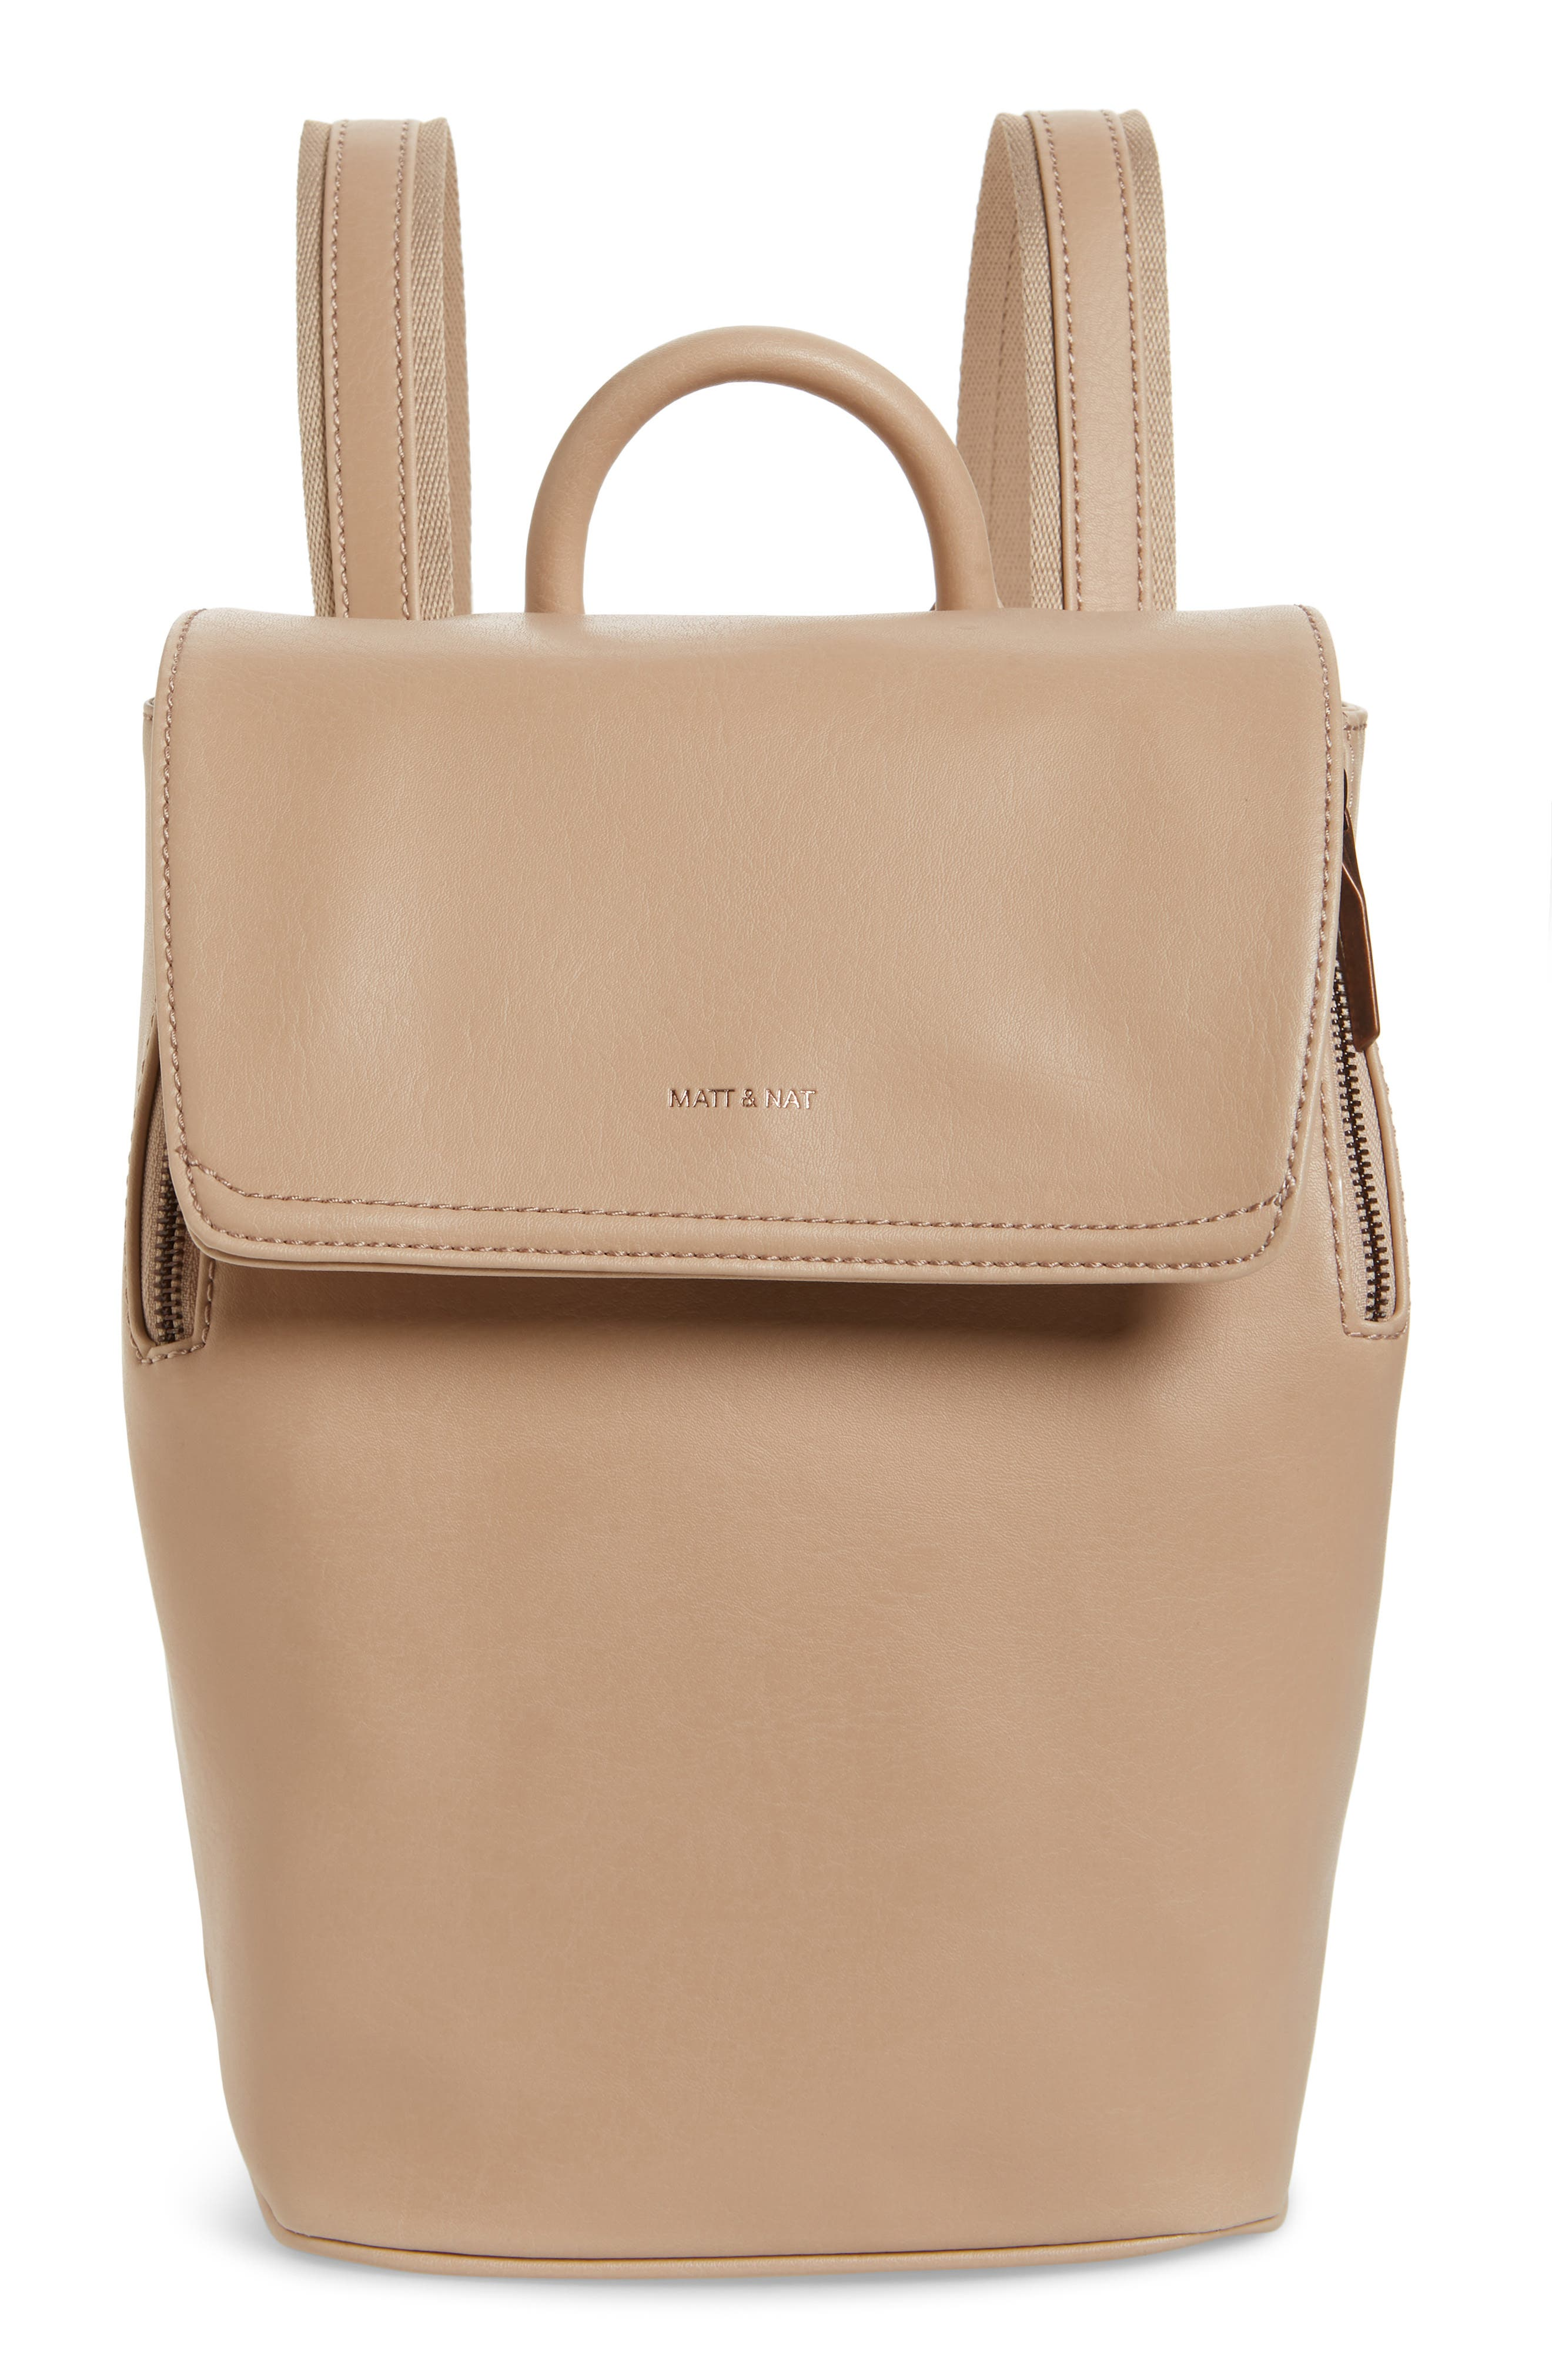 Matt & Nat Mini Fabi Faux Leather Backpack - Beige